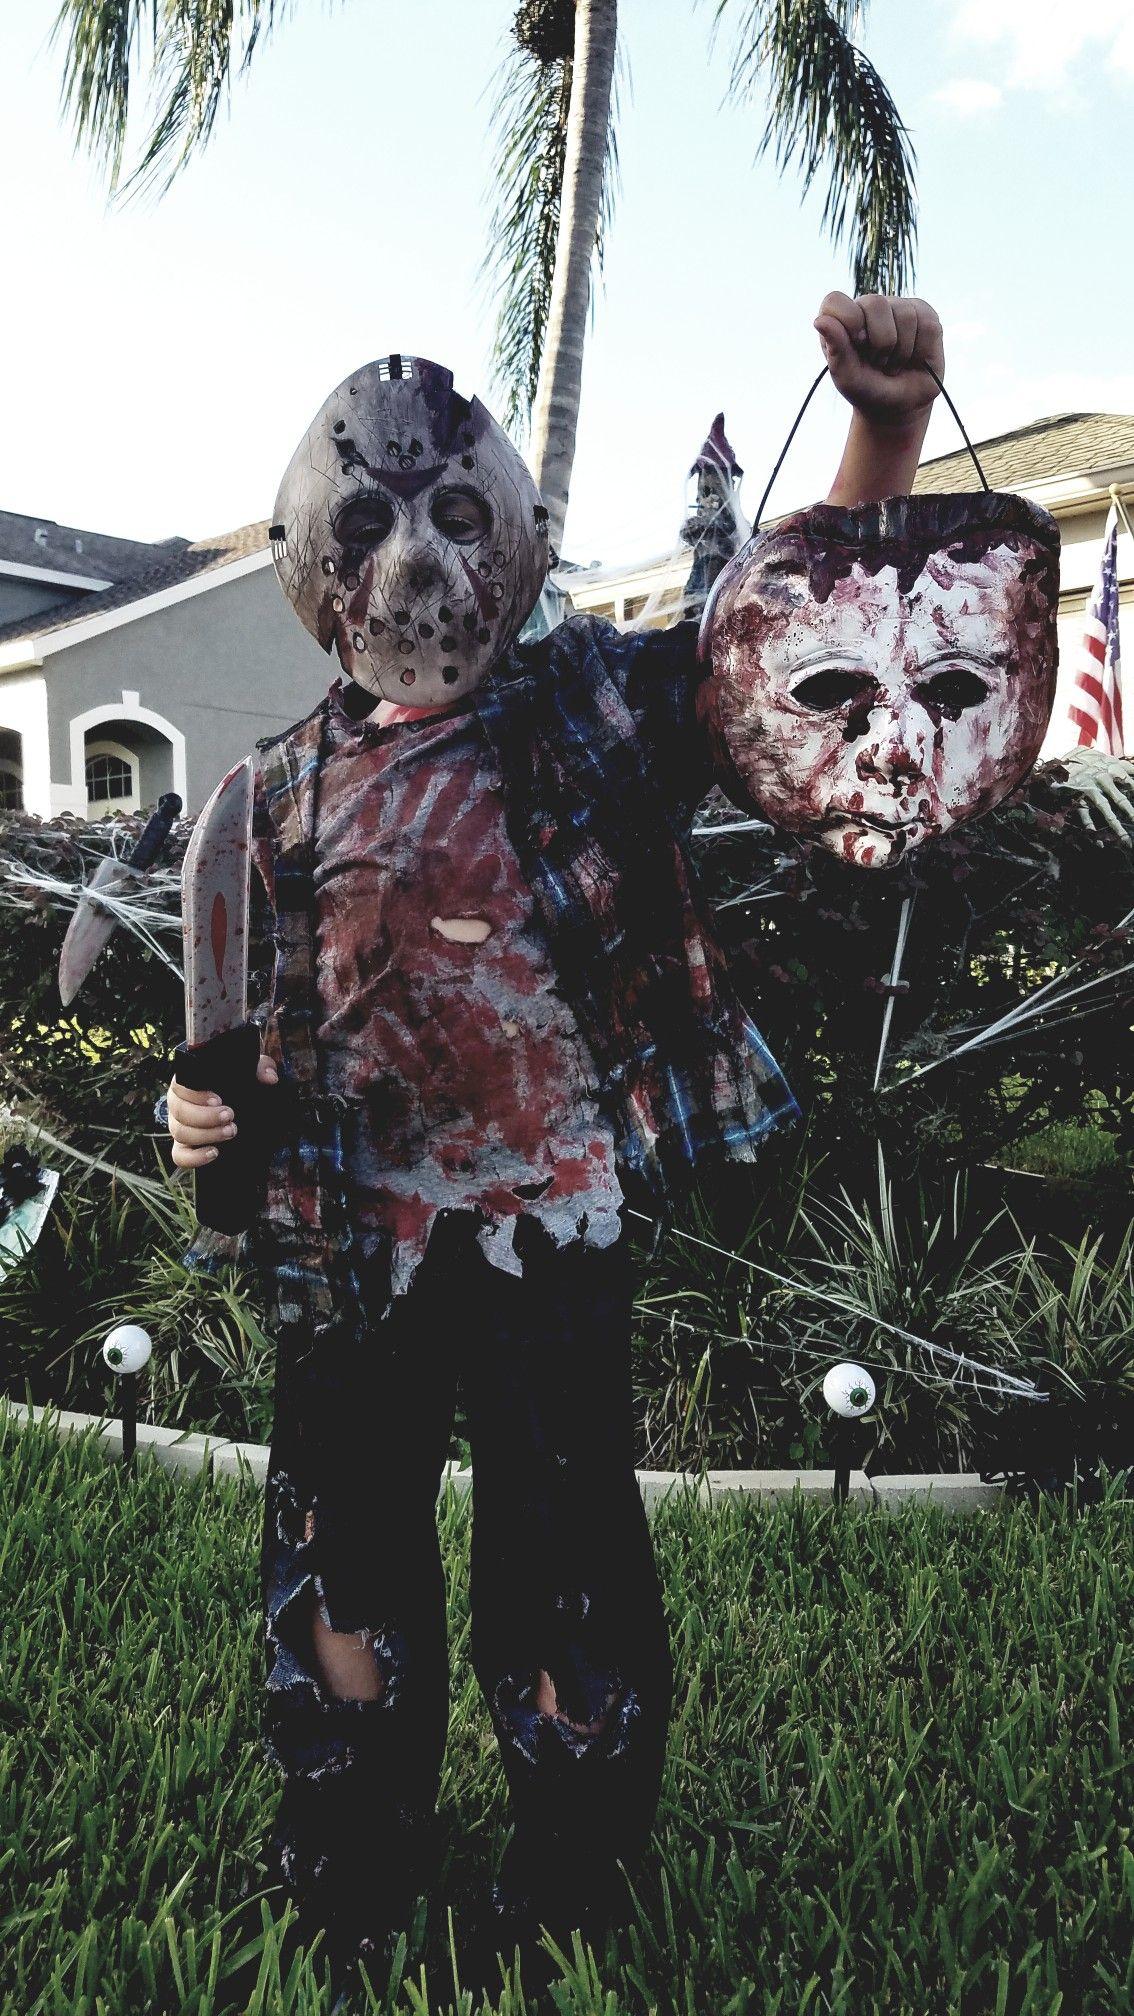 Jason costume / Michael Myers candy bucket 😂 Halloween